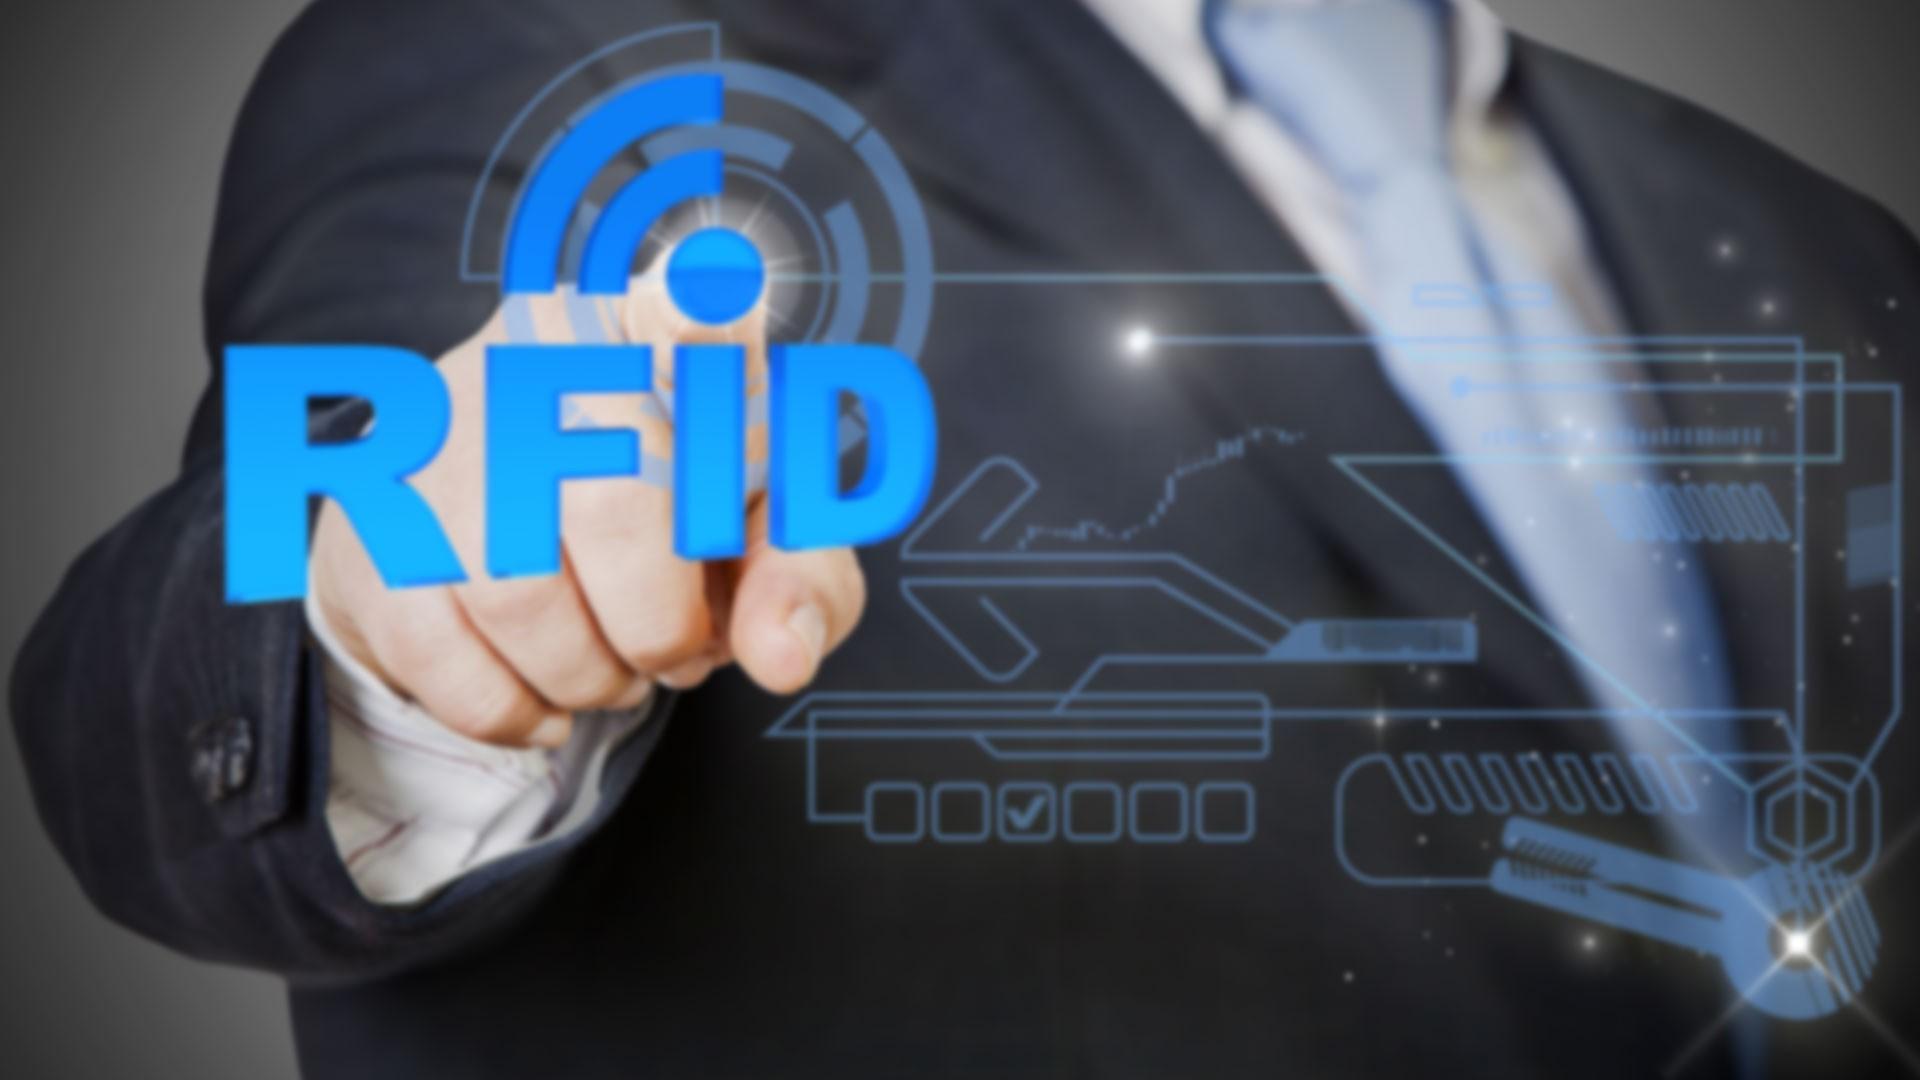 Universal RFID